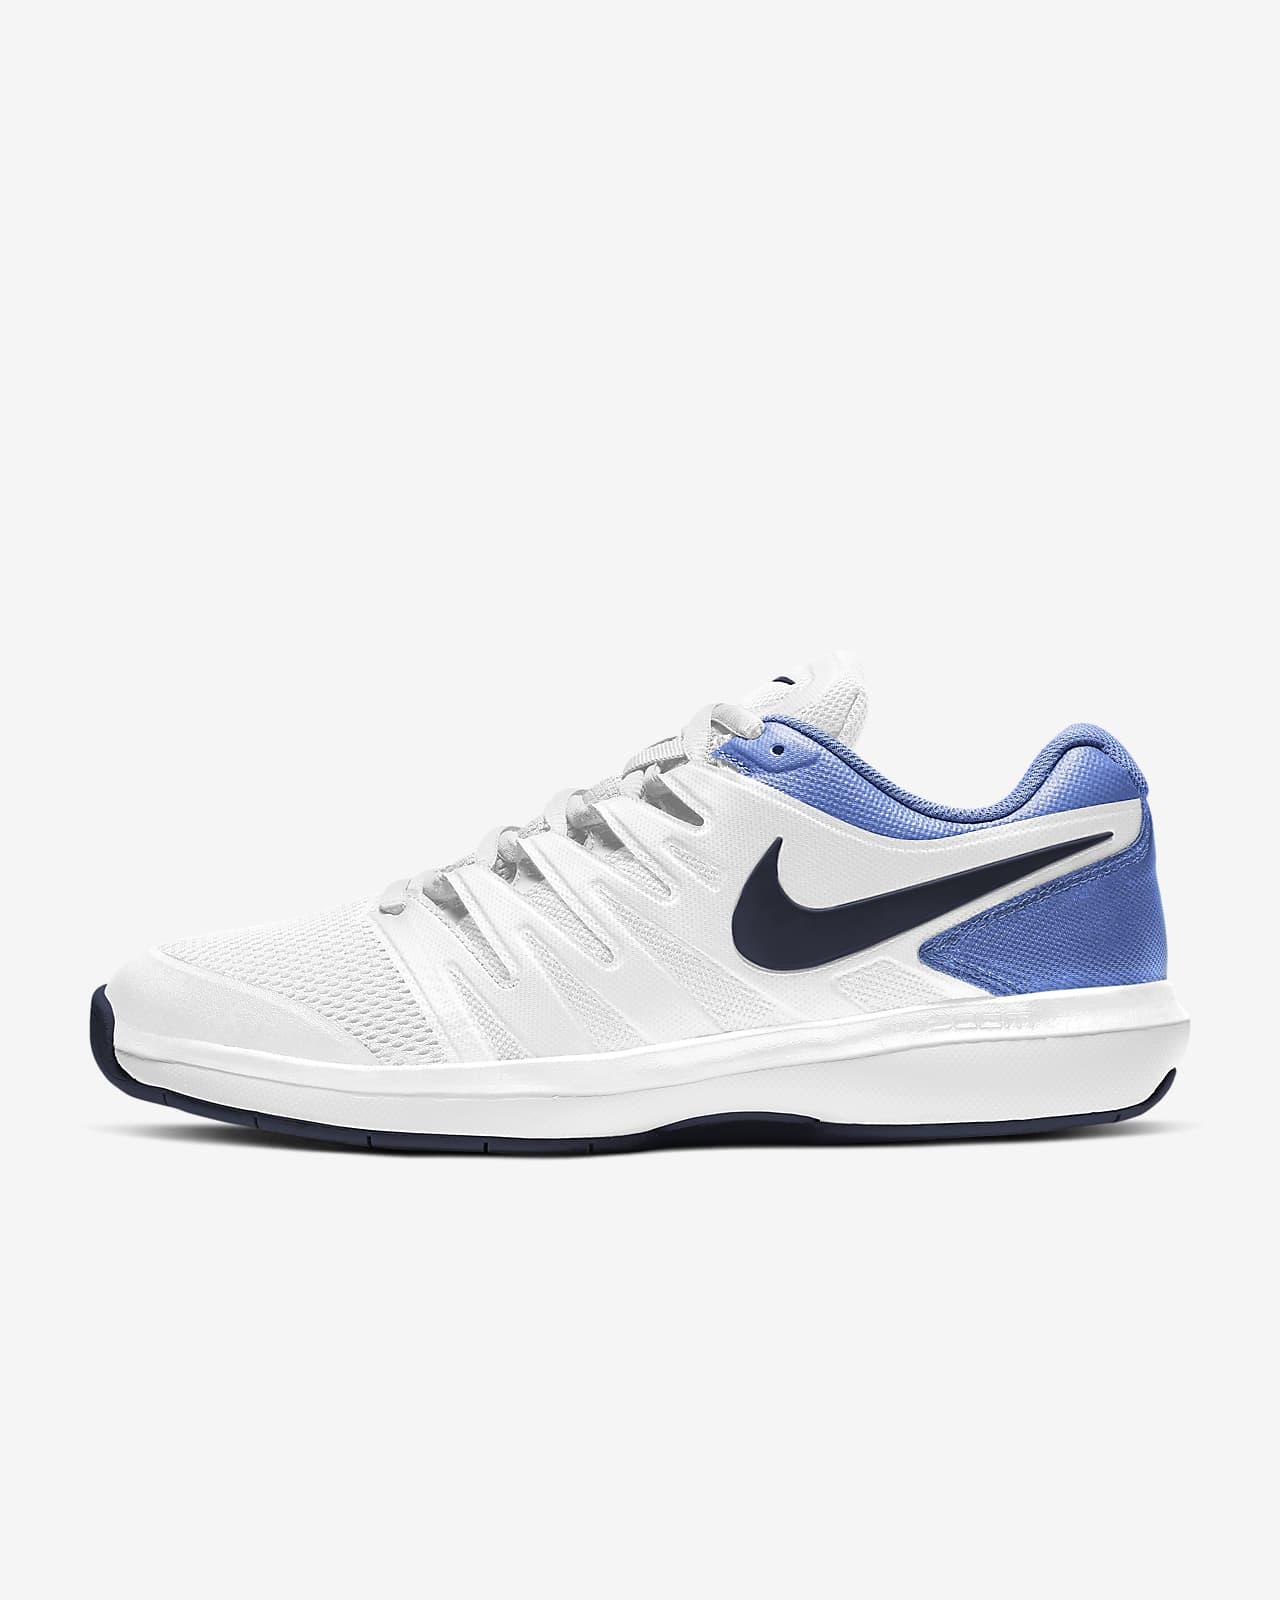 Carpet Tennis Shoe. Nike LU